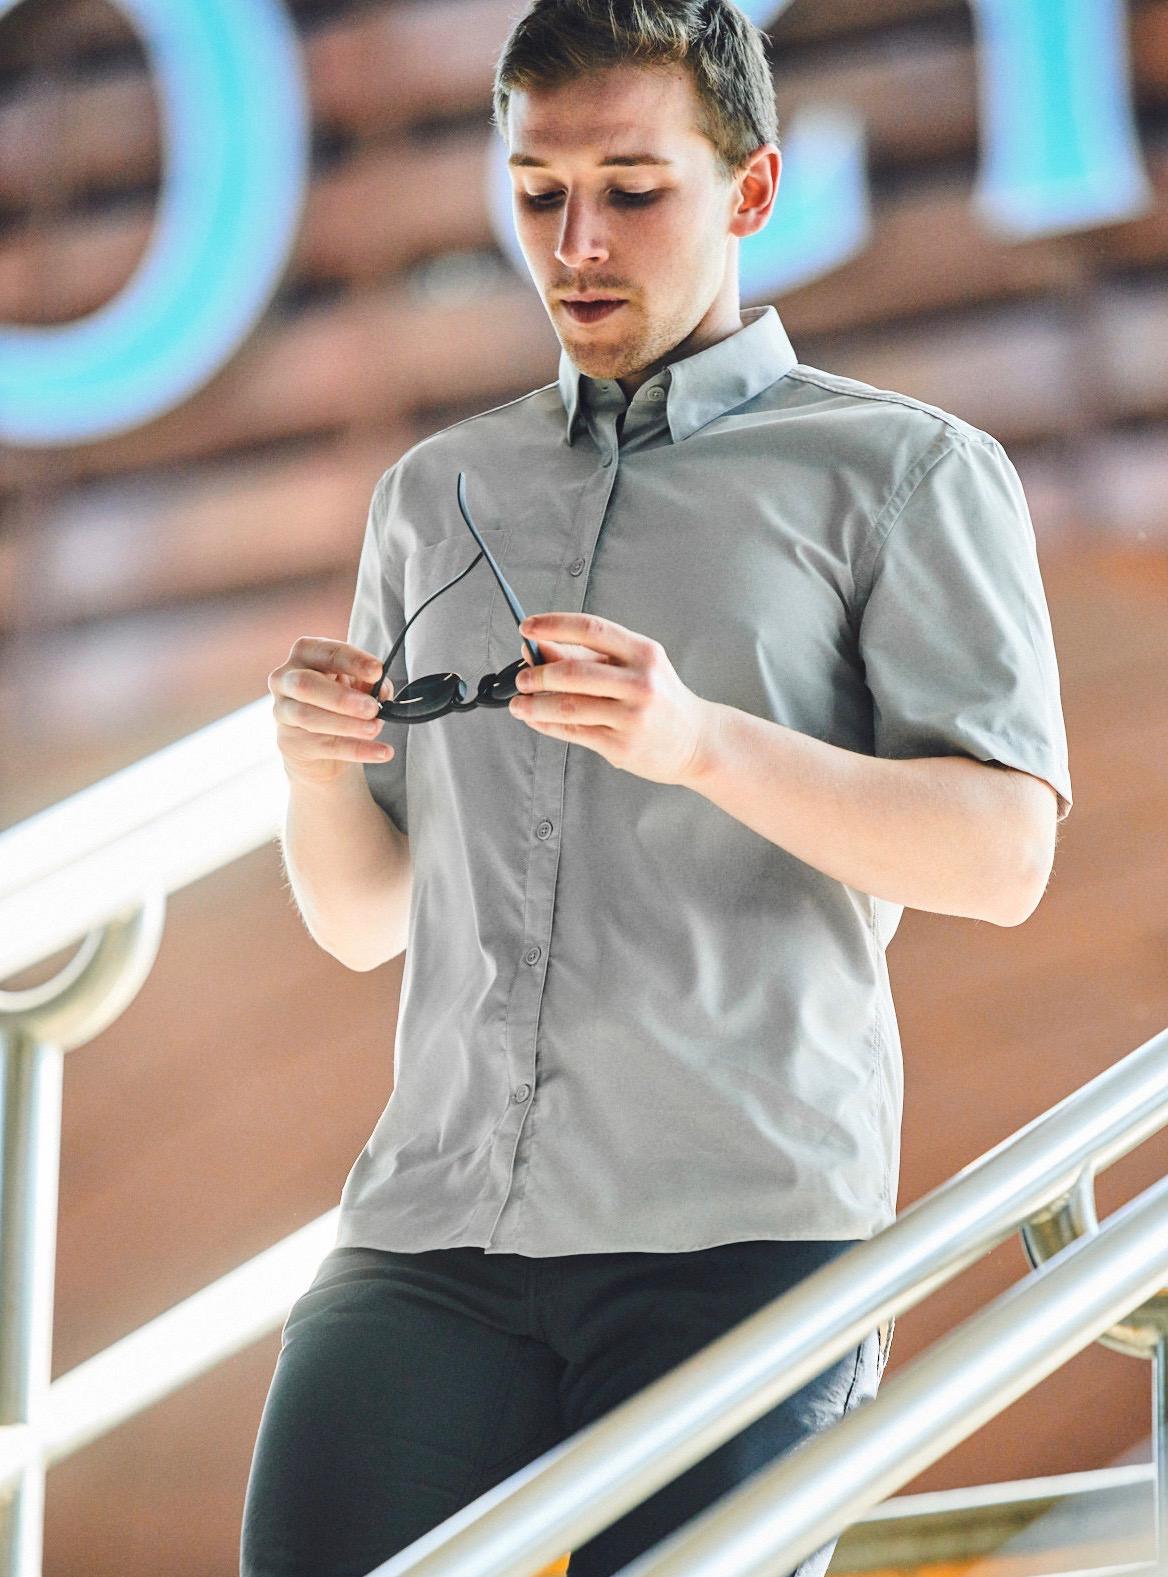 Western Rise AirLight Short Sleeve Shirt